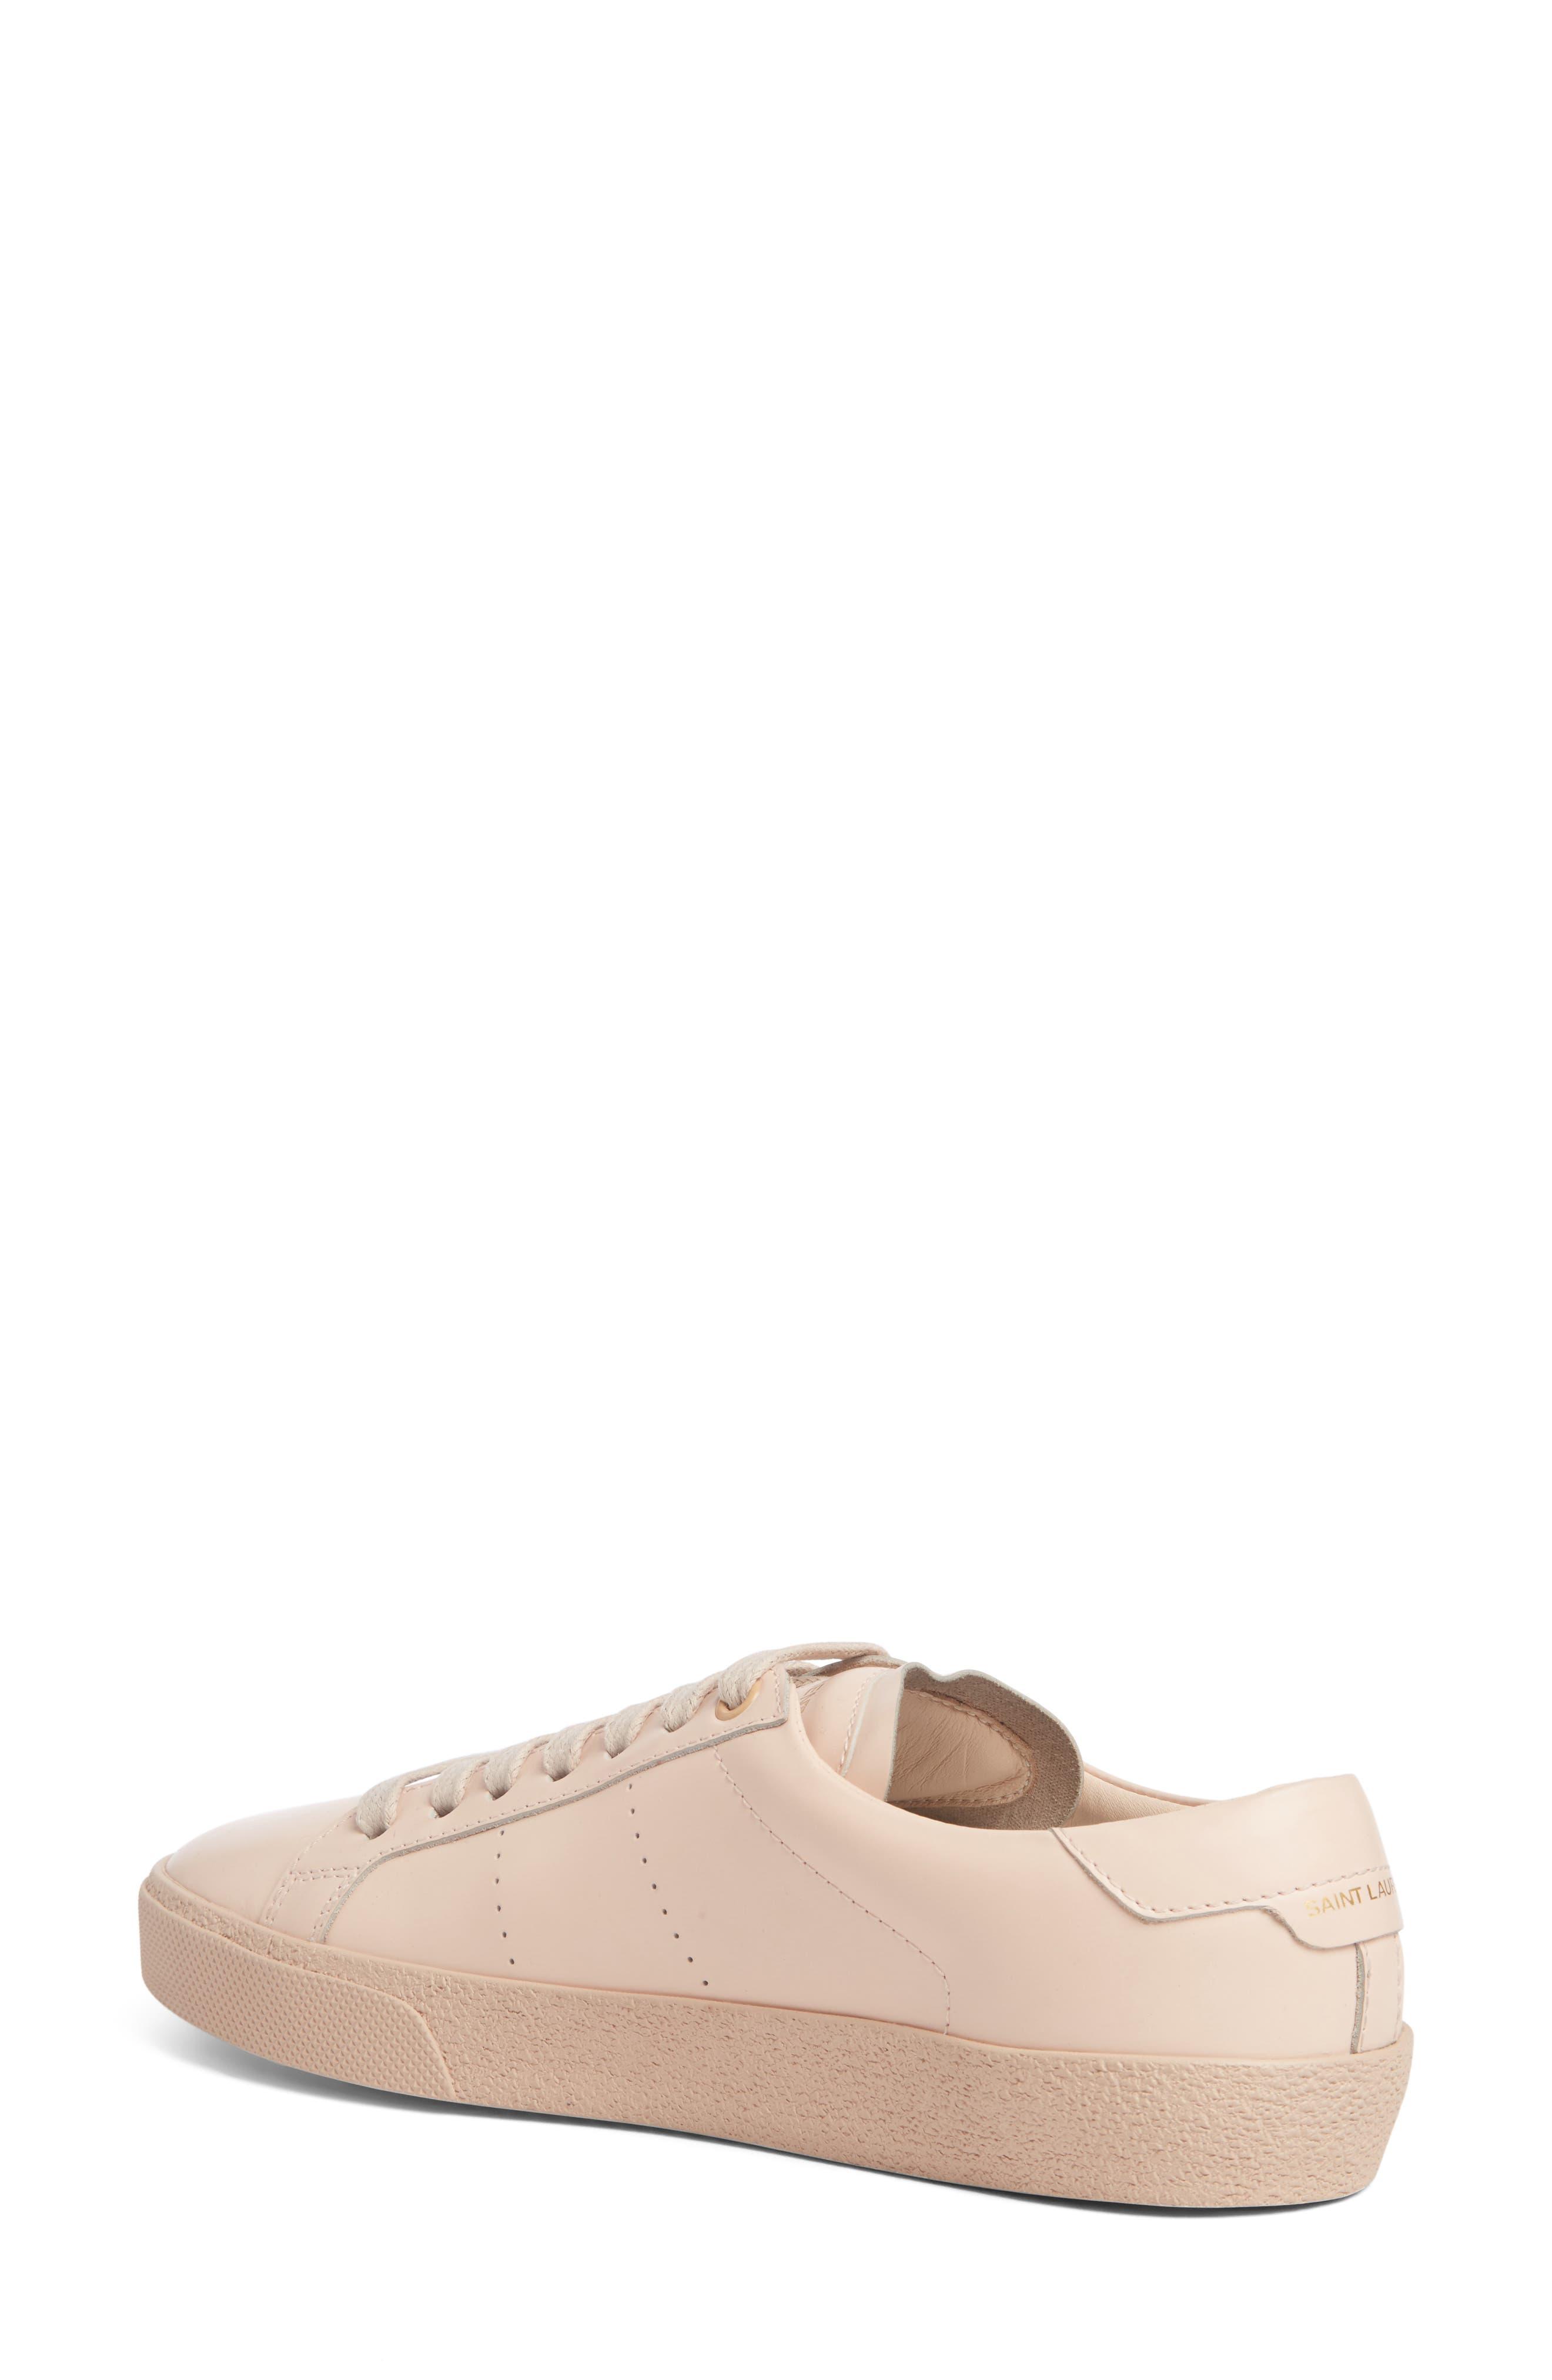 Court Classic Sneaker,                             Alternate thumbnail 2, color,                             650